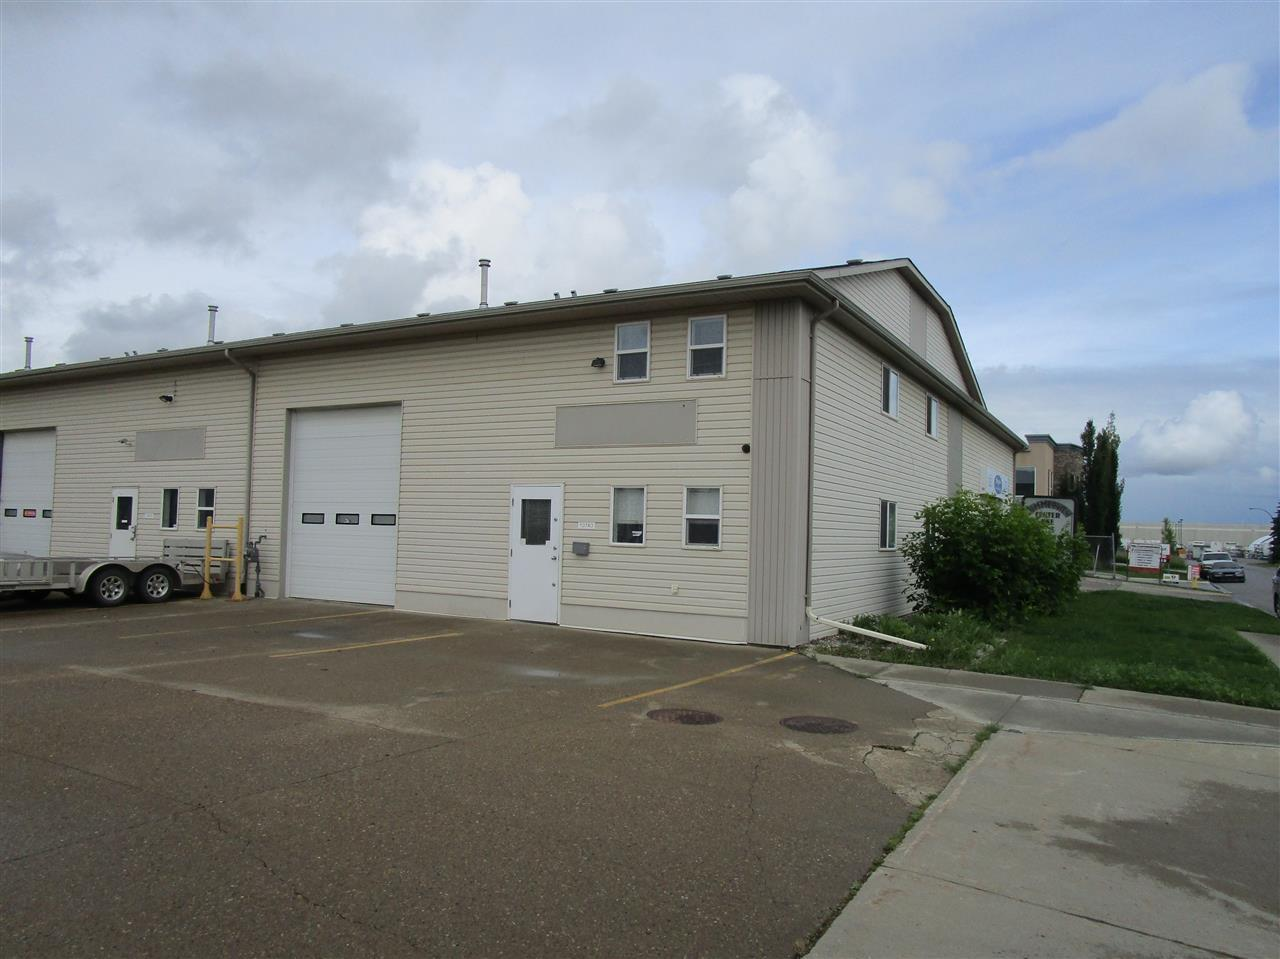 10740 180 St Nw, Edmonton, Alberta  T5S 2S4 - Photo 1 - E4204455